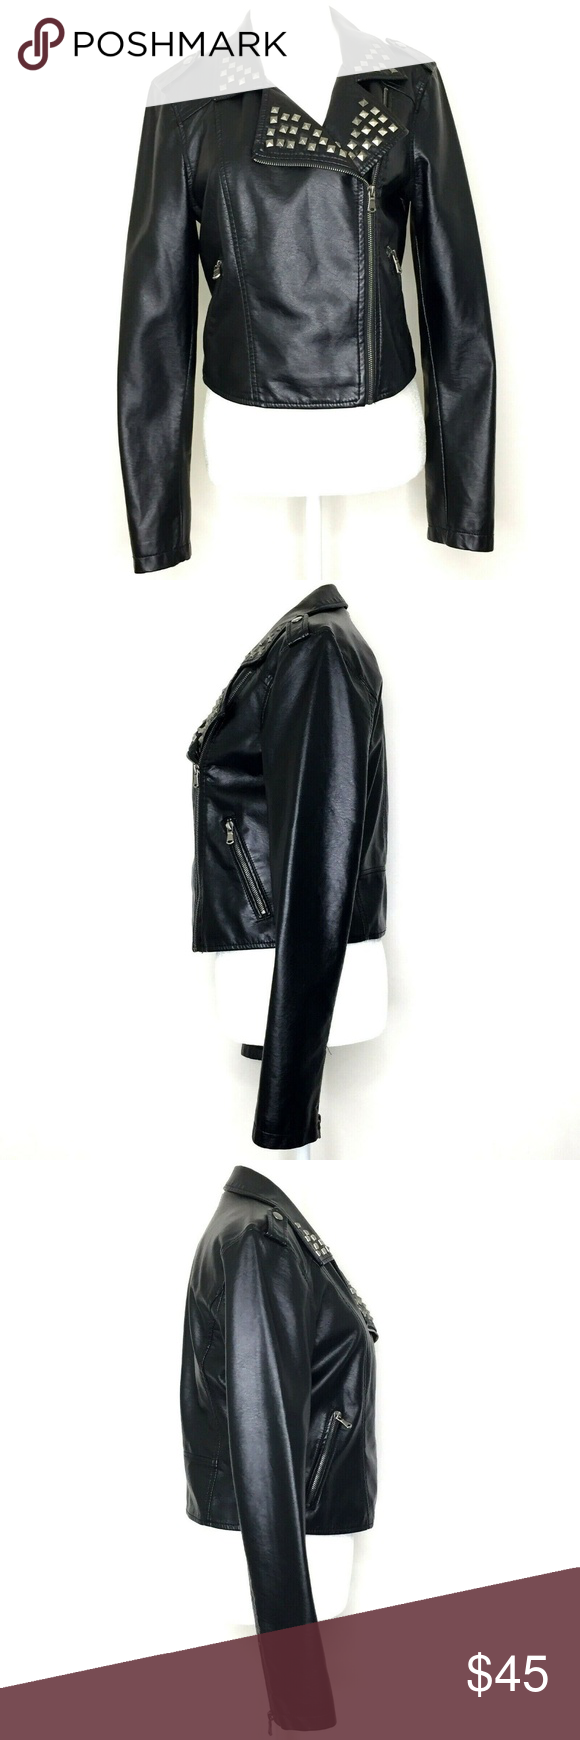 Ashley Outerwear Faux Leather Moto Biker Jacket Ashley Outerwear Women S Black Faux Leather Moto Jacket Black Faux Leather Moto Jacket Biker Jacket Outerwear [ 1740 x 580 Pixel ]